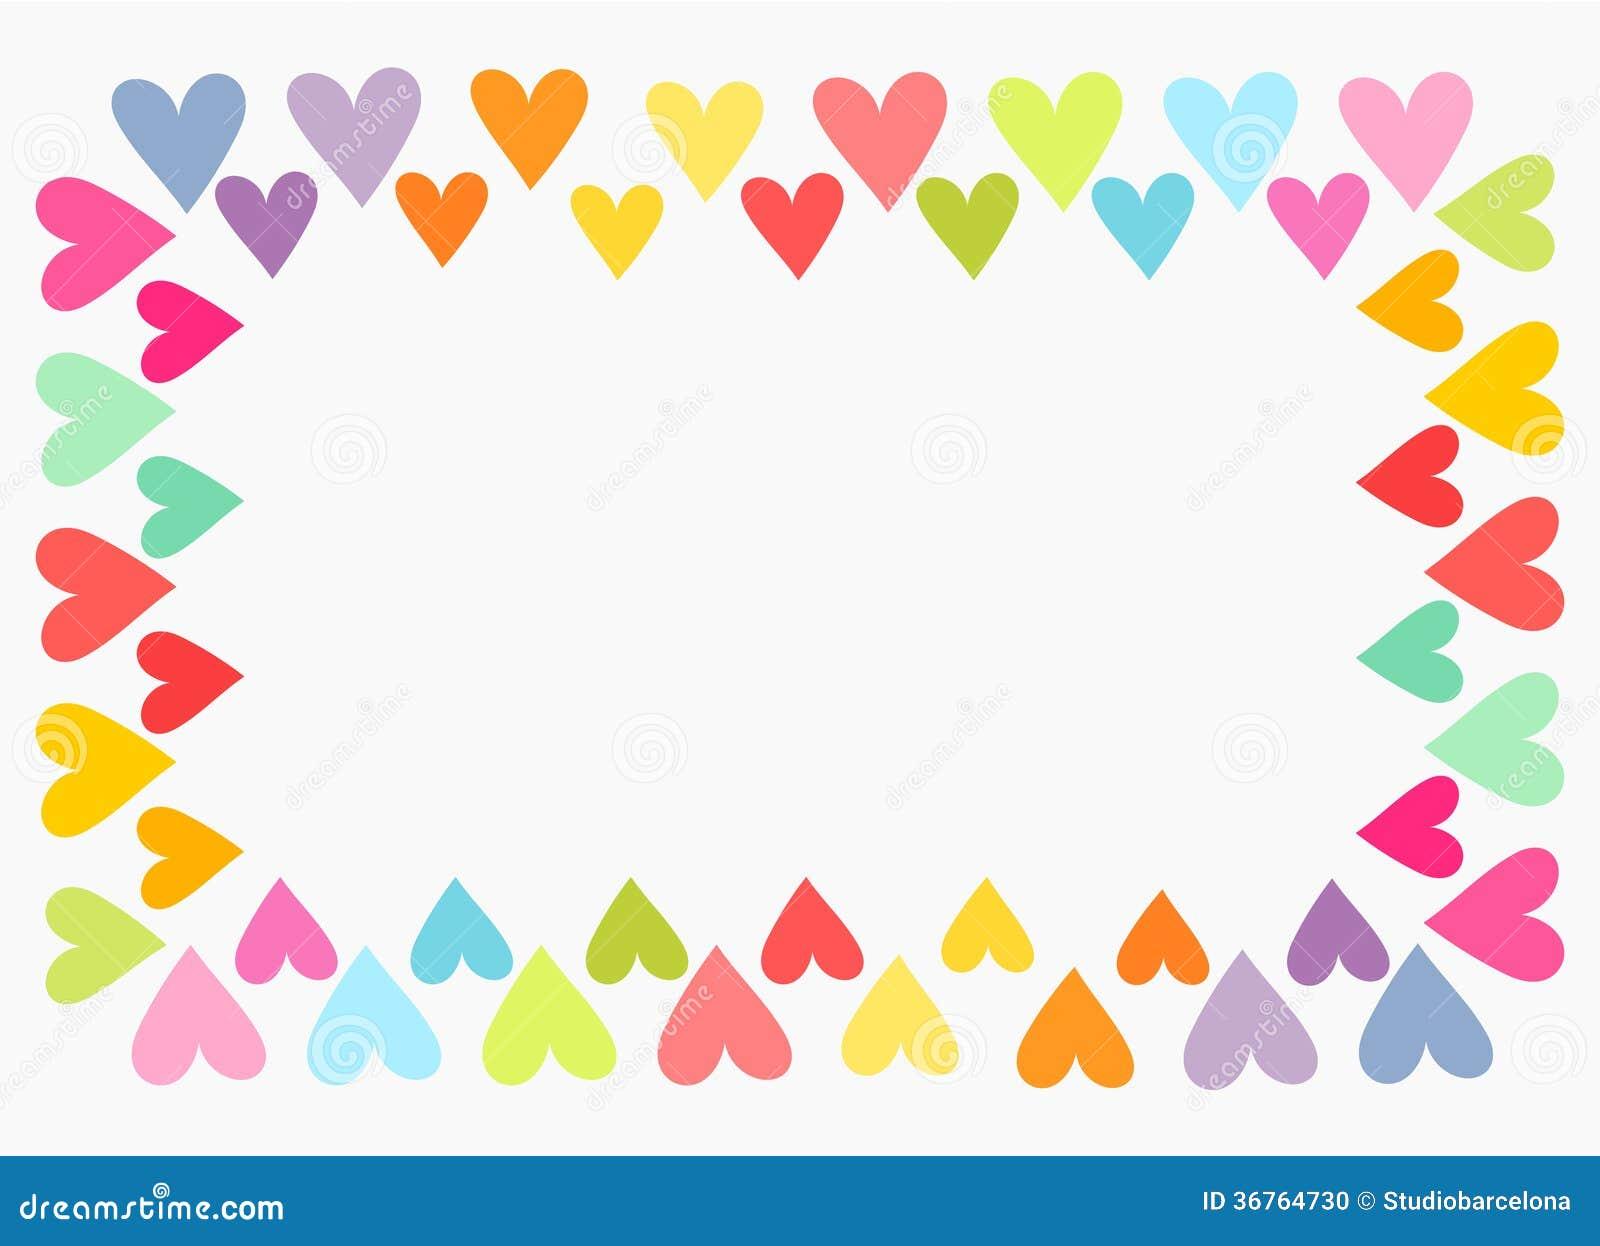 Colorful heart border stock illustration. Illustration of ...